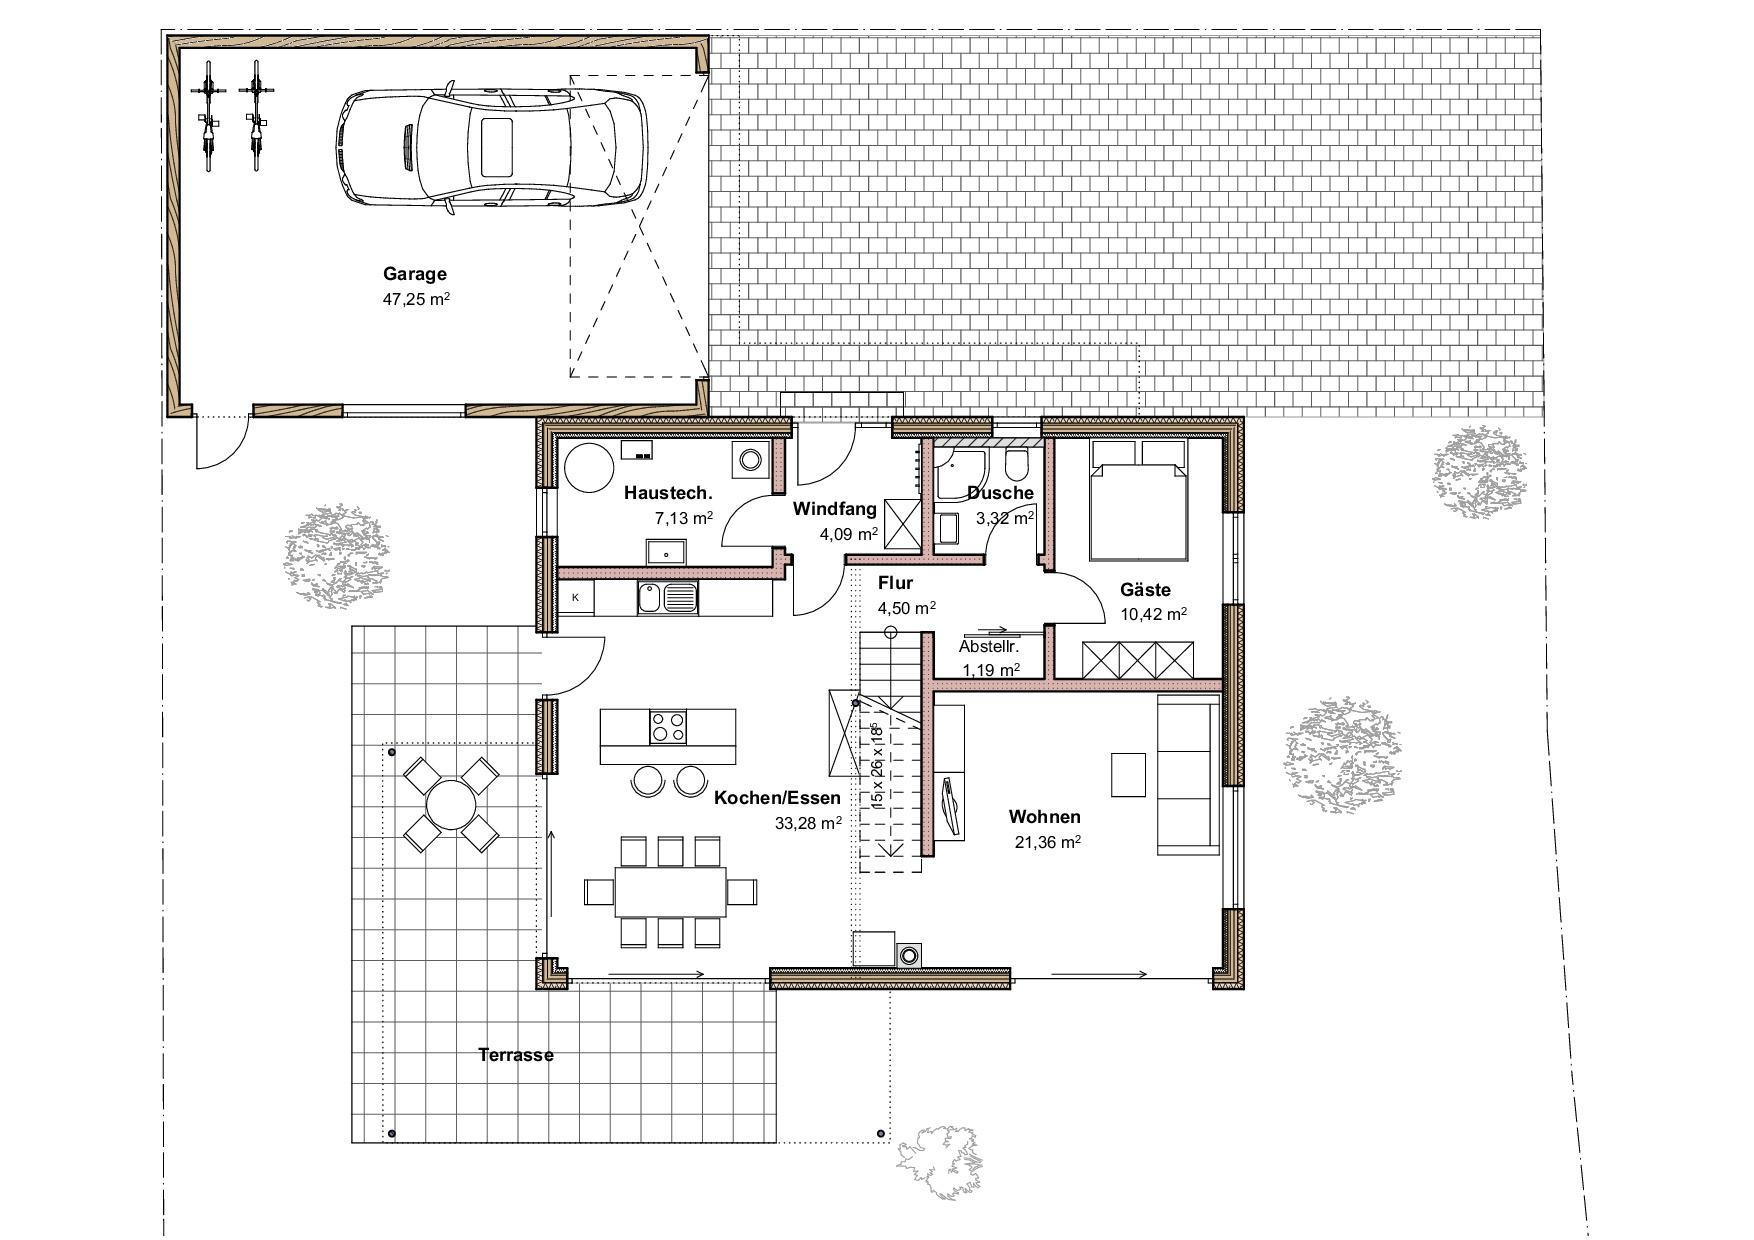 Grundriss, Erdgeschoss, Einfamilienhaus in Oberstaufen